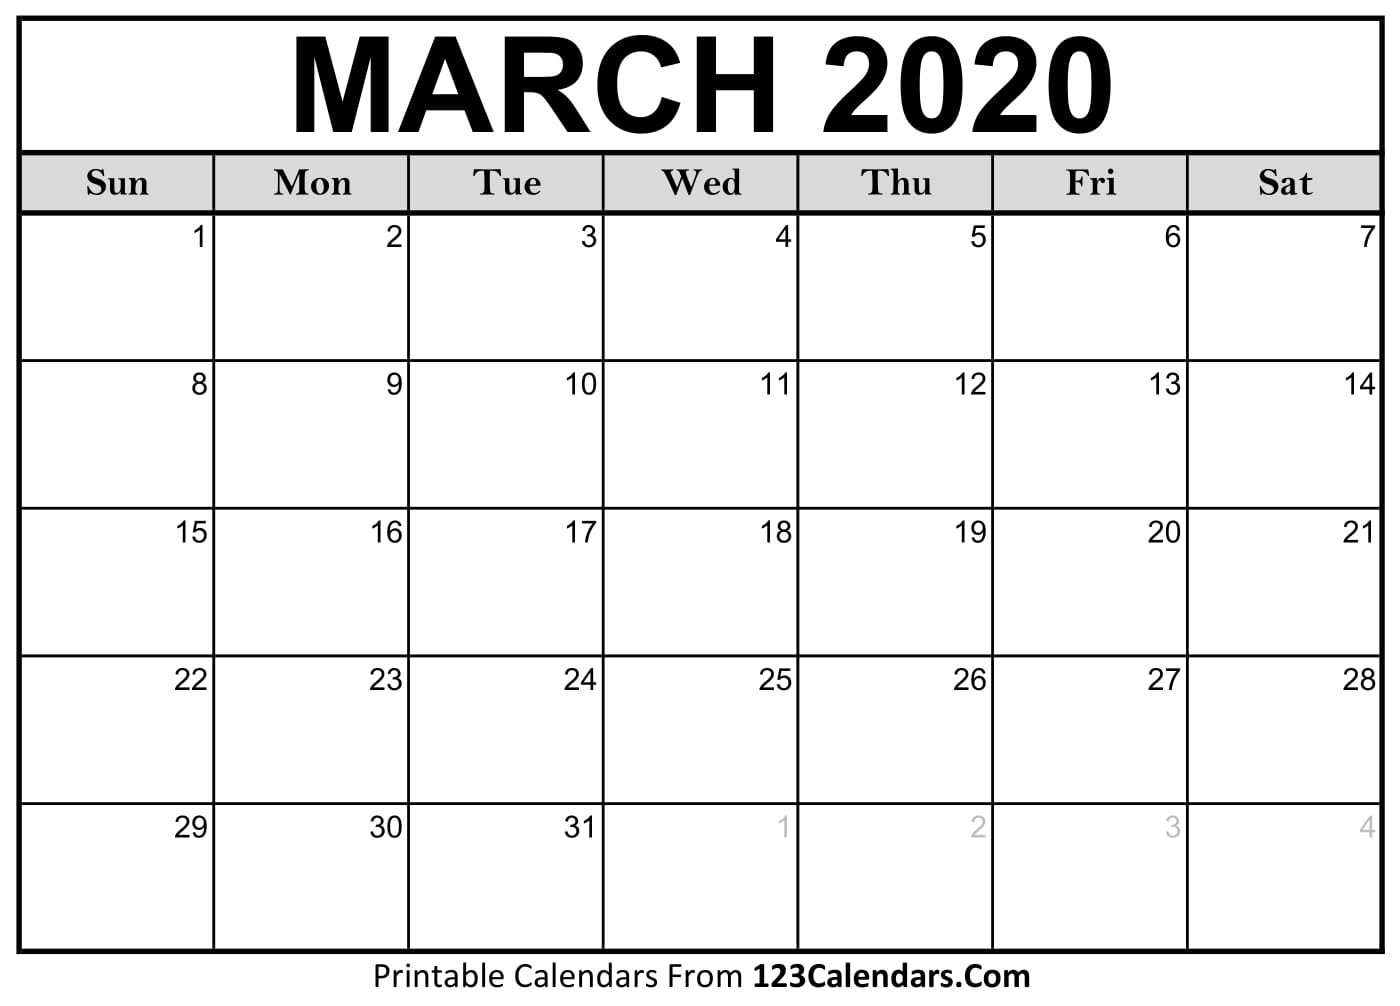 March 2020 Printable Calendar | 123Calendars for 2020 Calander To Write On